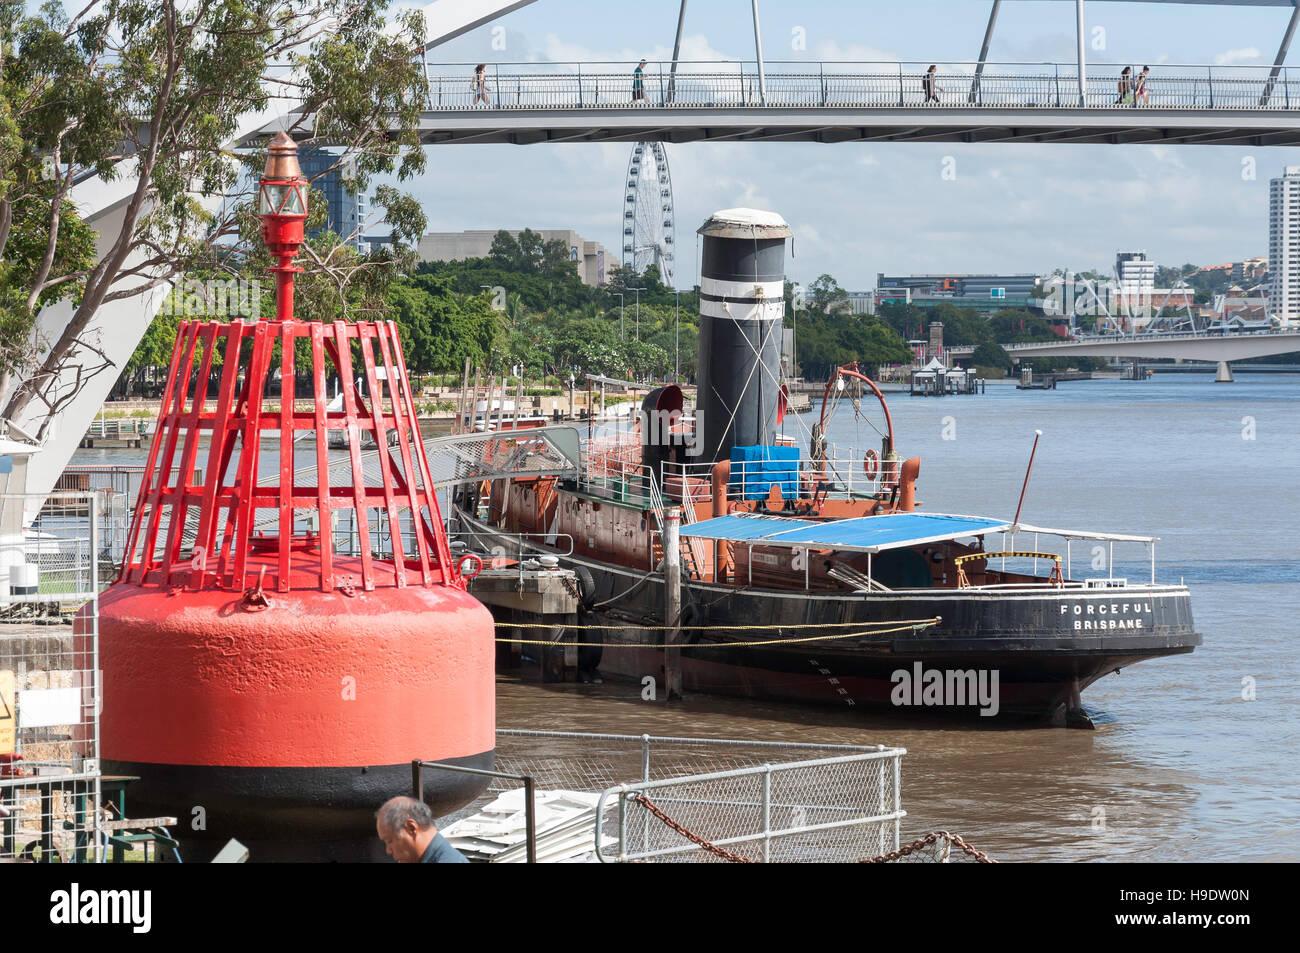 Steam tug 'Forceful' at Queensland Marine Museum Park, Kangaroo Point, Brisbane City, Brisbane, Queensland, - Stock Image